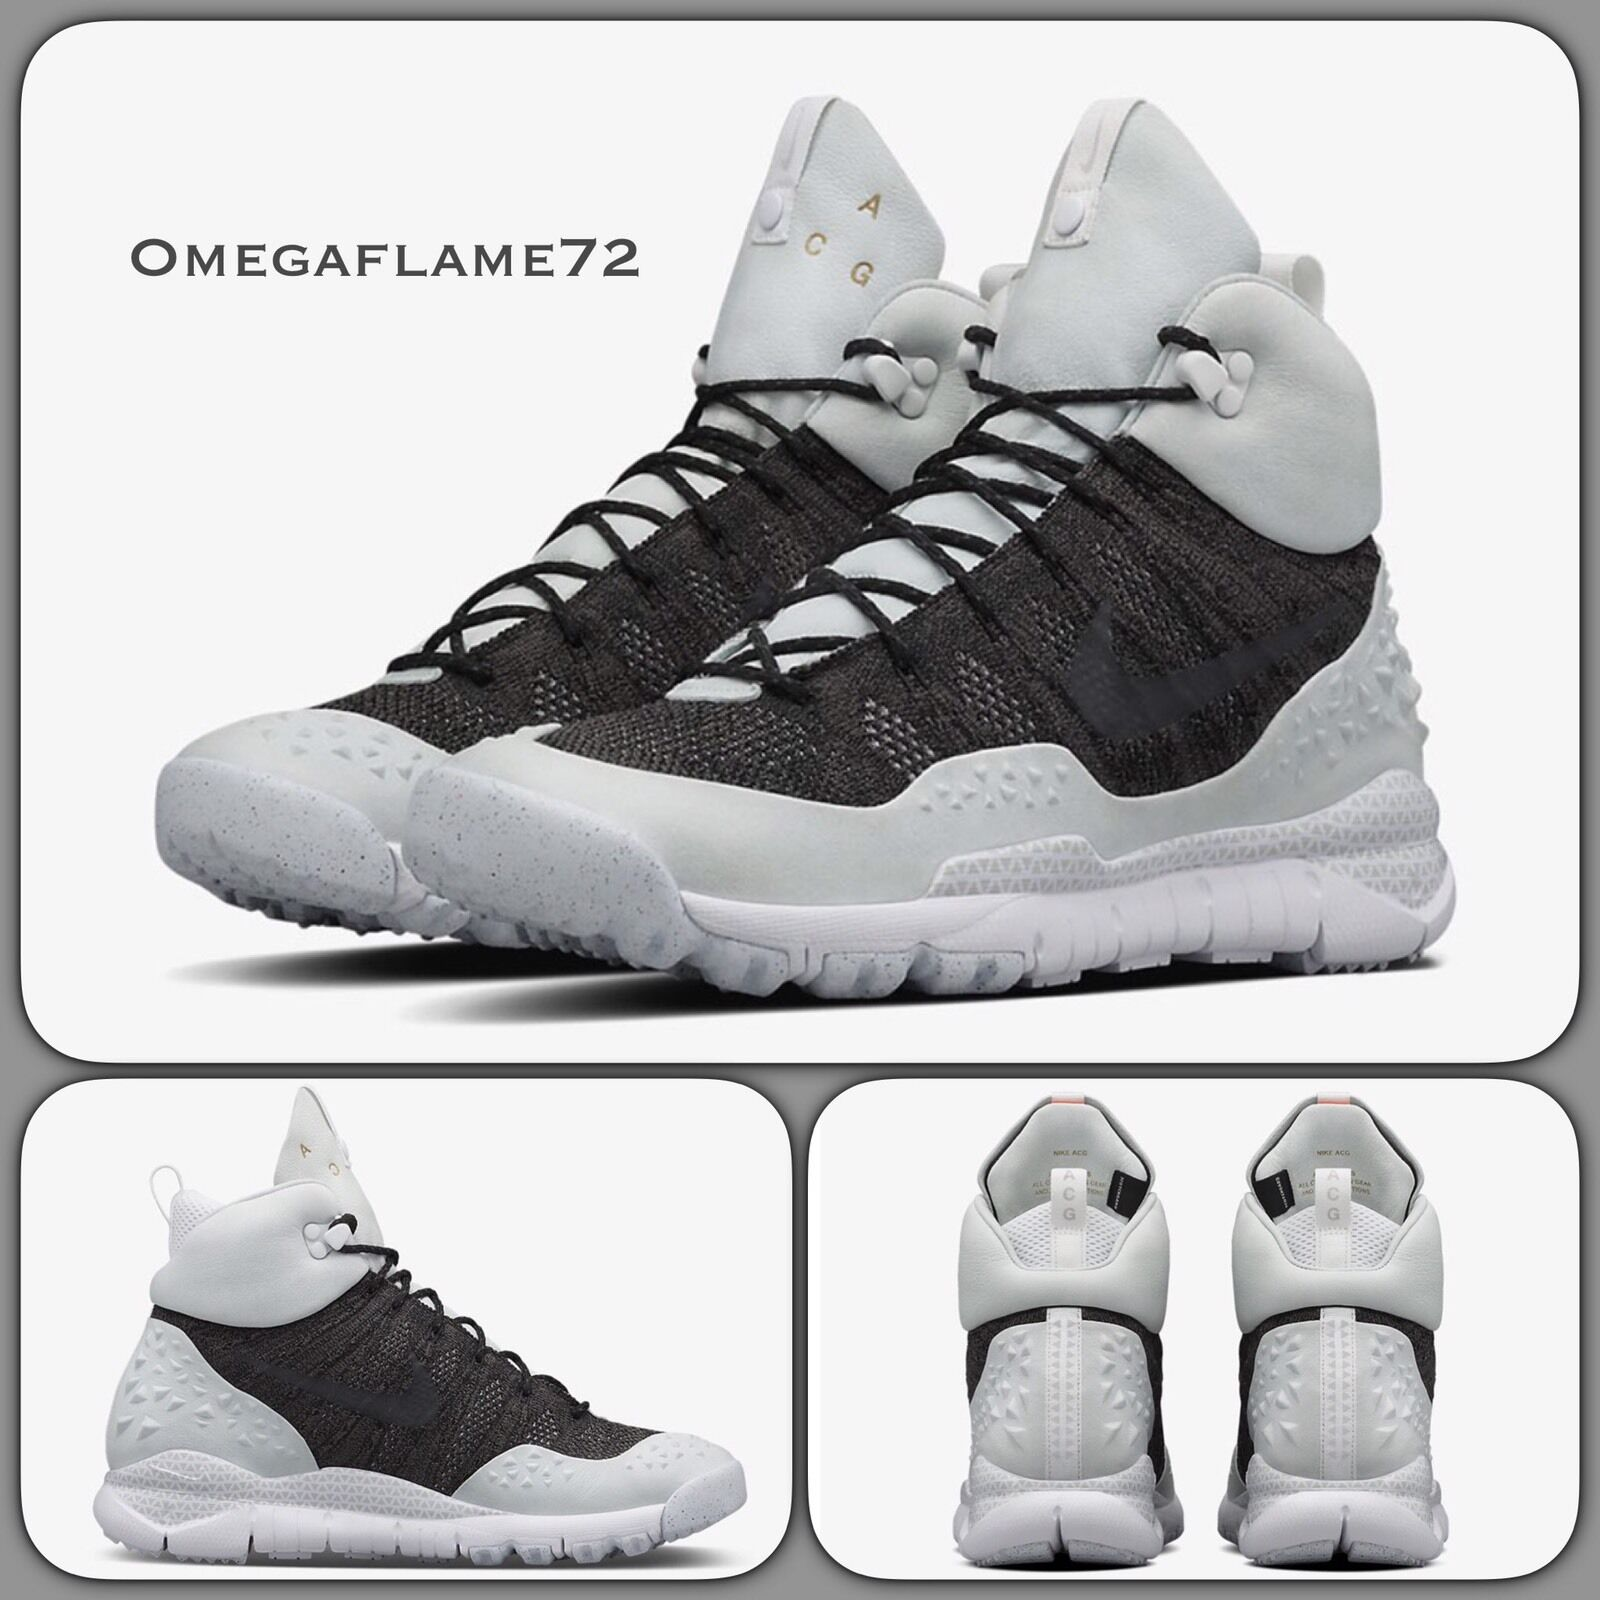 Nike Lupinek Flyknit ACG 5 826077-002 EUR 37.5 USA 5 ACG Nero Bianco 5af4fb